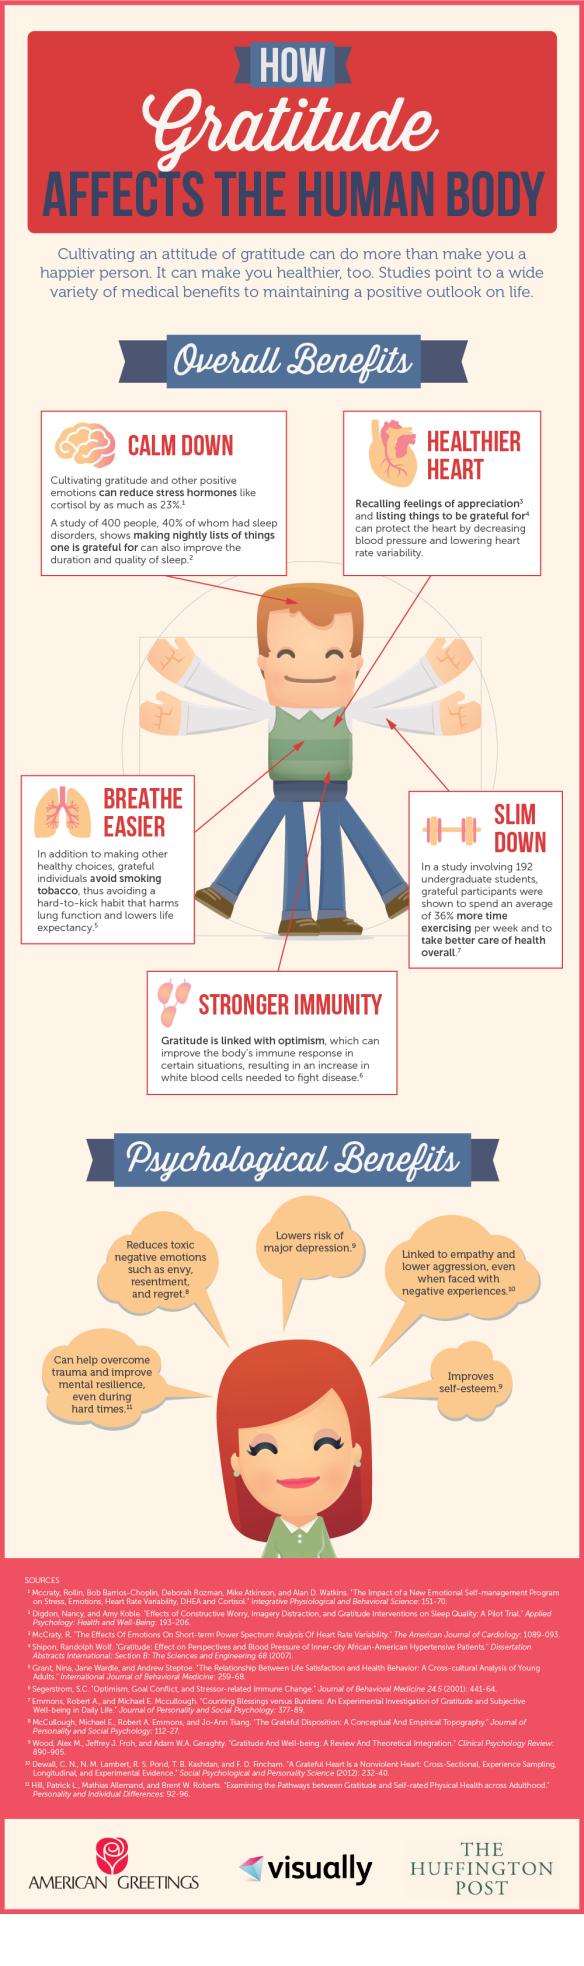 Gratitude_Infographic_v3